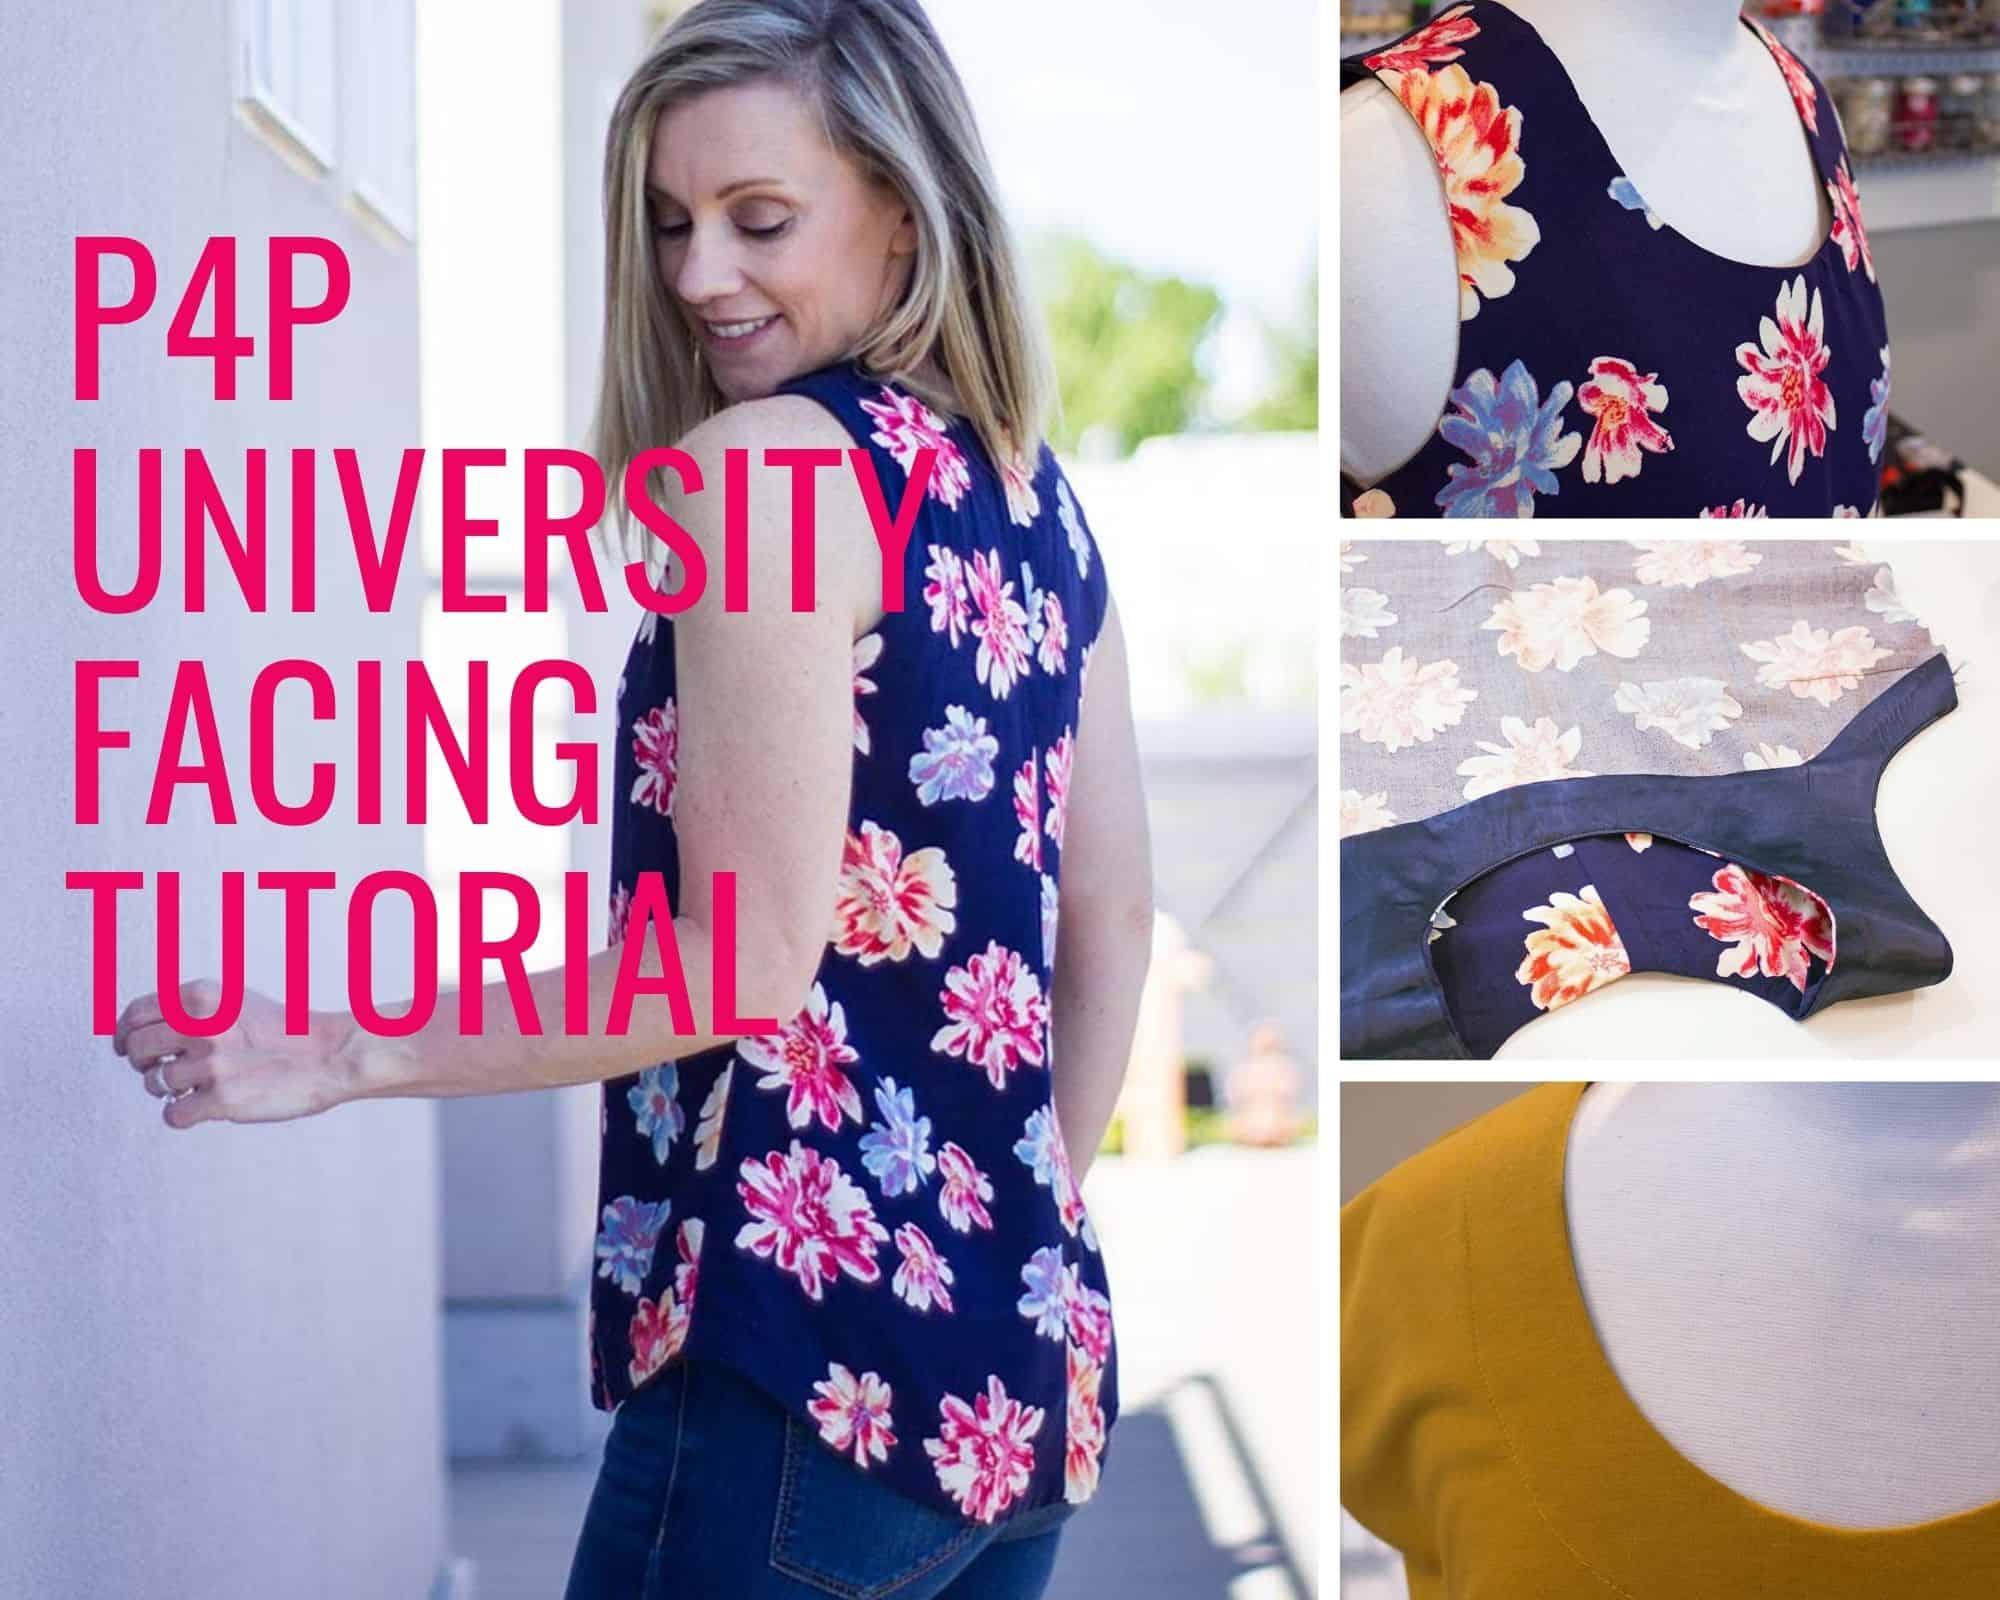 P4P University Facing Pic